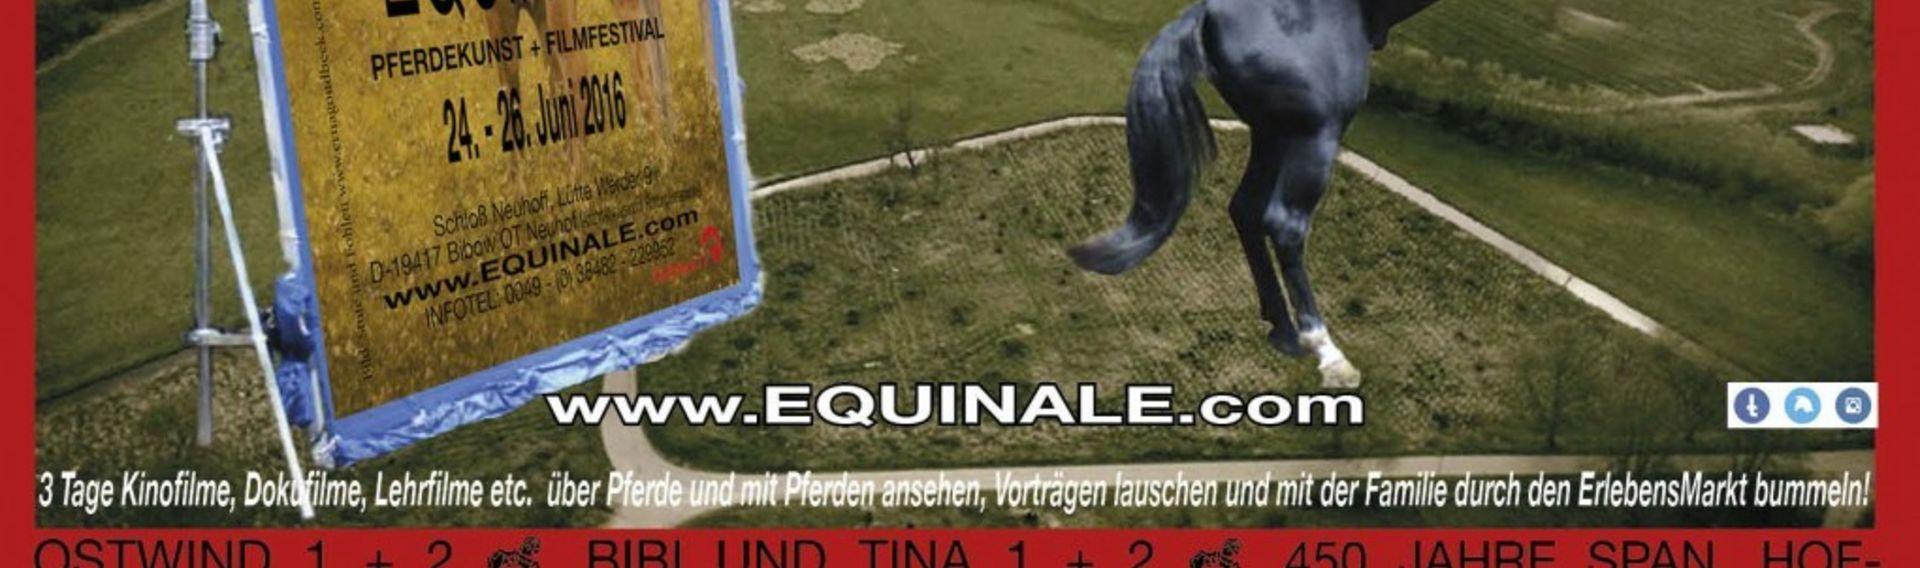 Equinale – Outdoor – PFERDE Filmfestival 2020